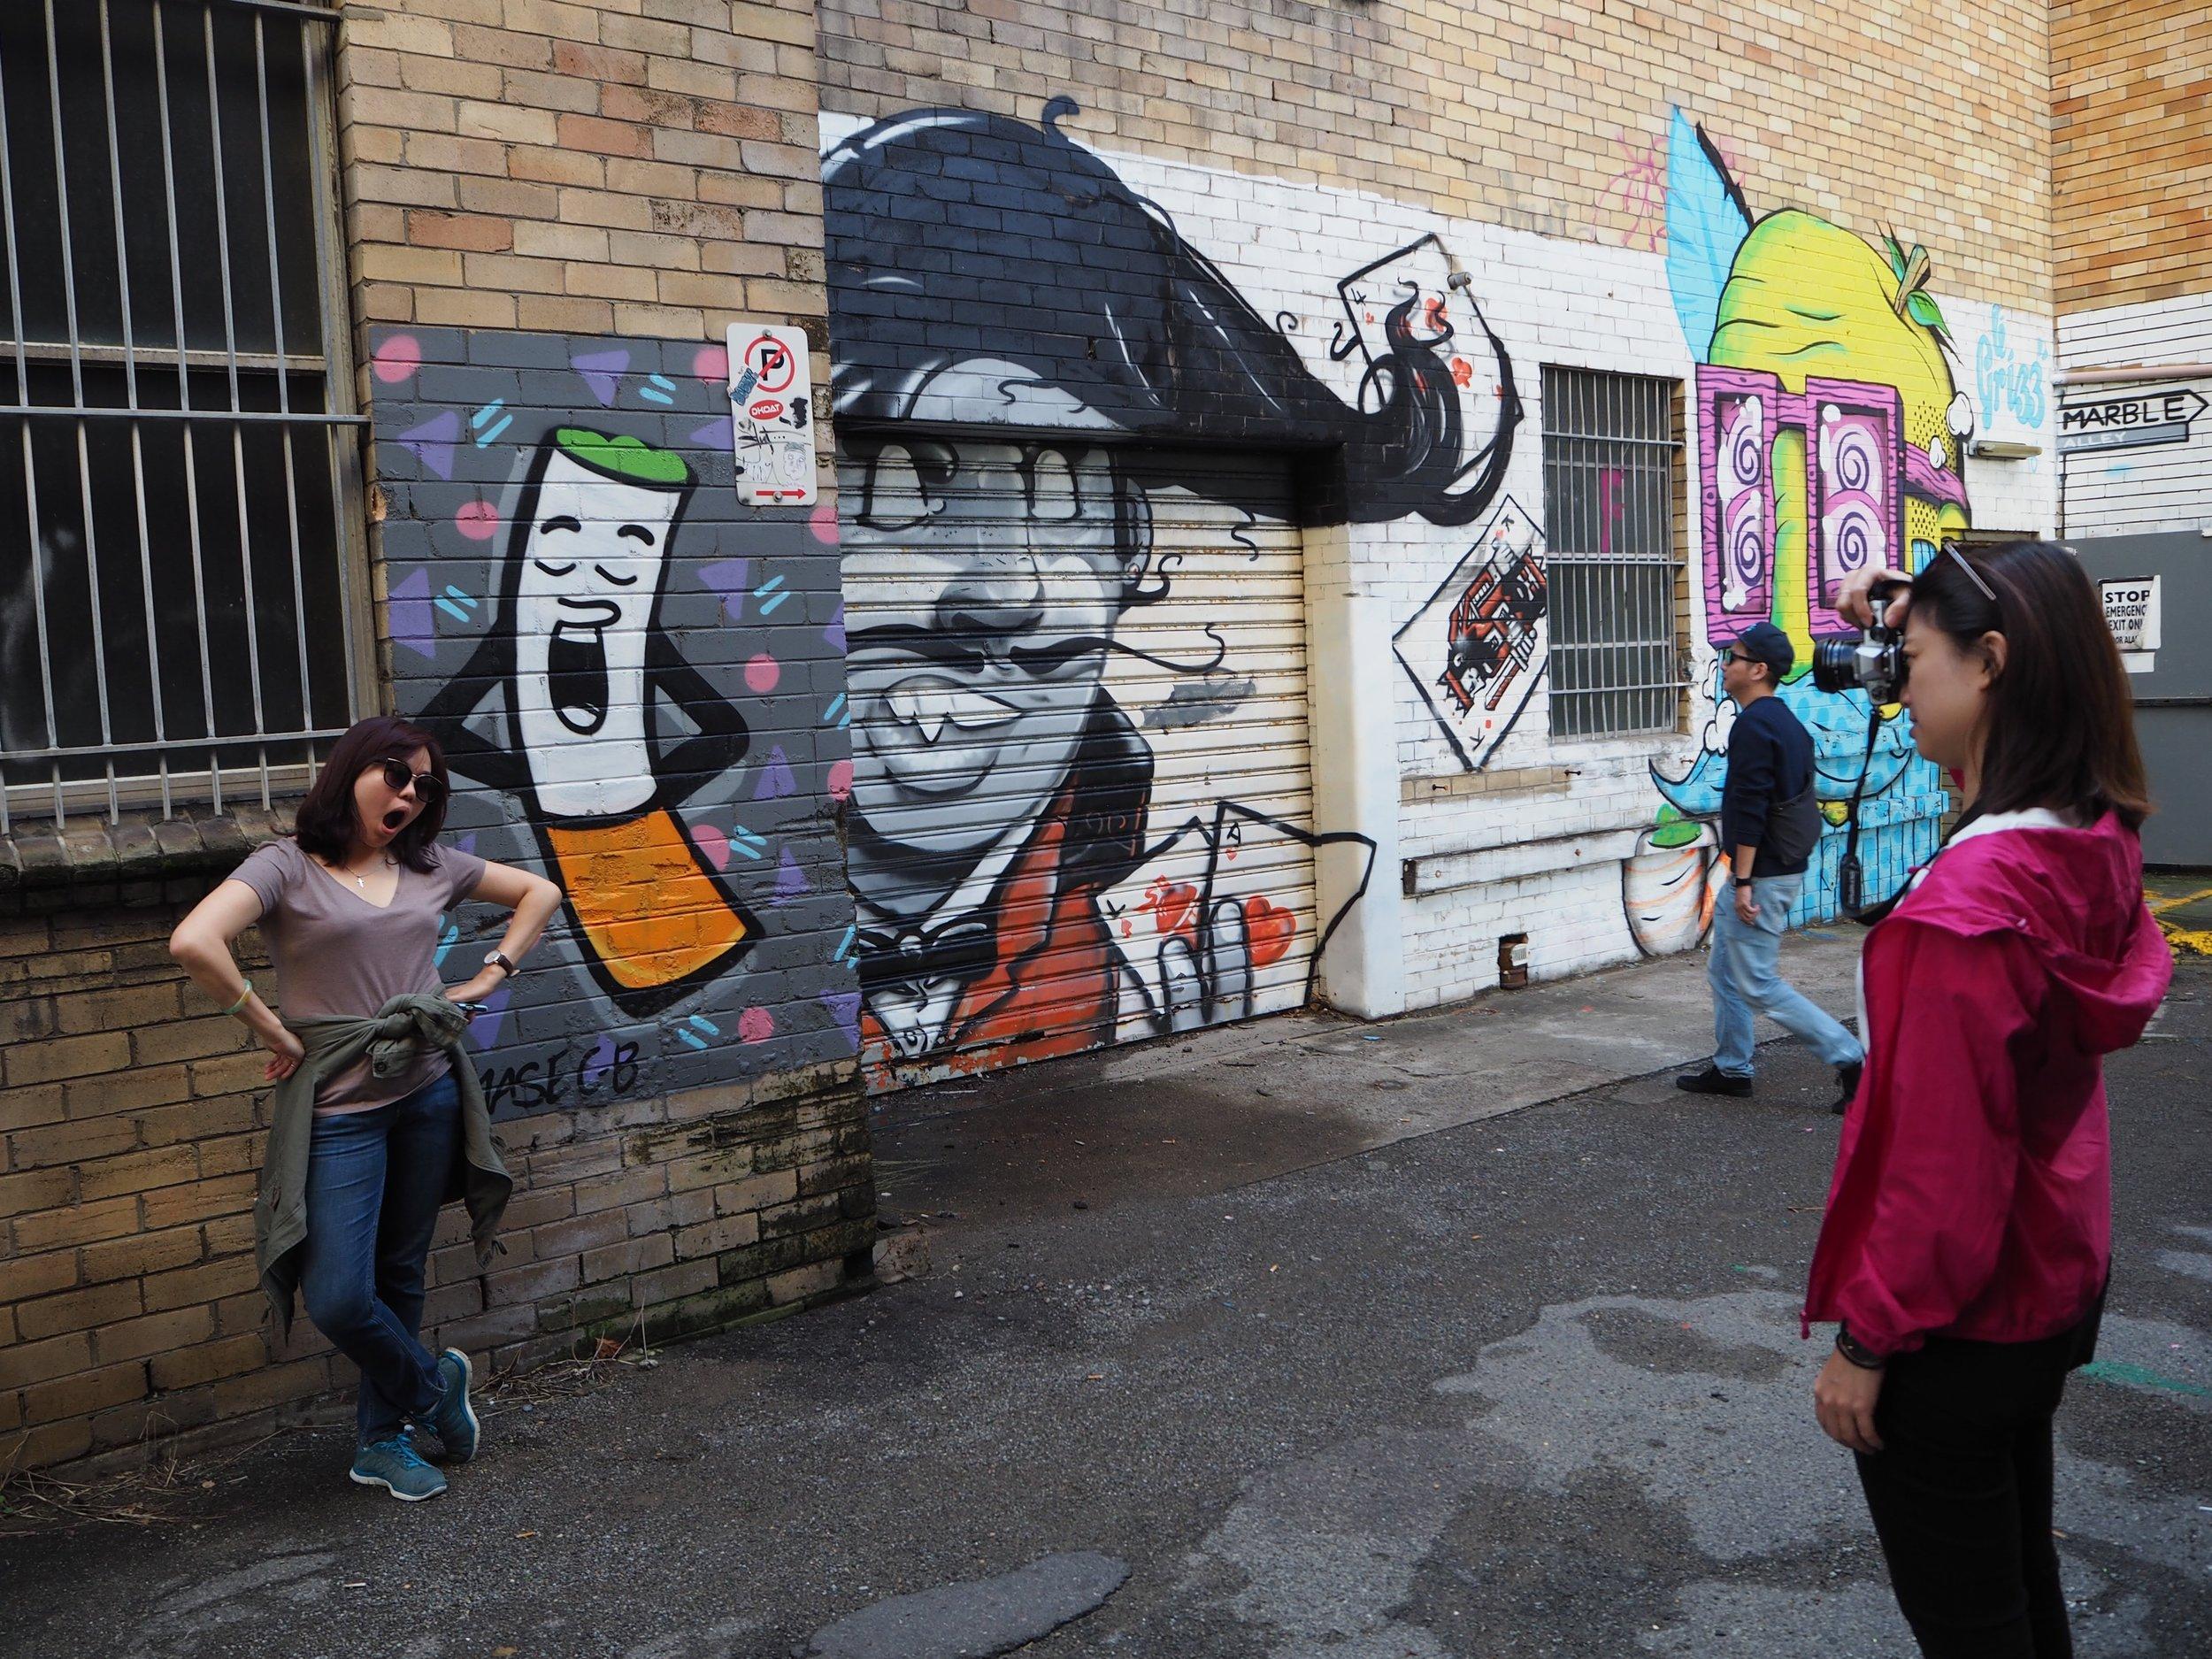 Street_Art_Walking Tour_Photograph_by_Simone_Sheridan003.jpg